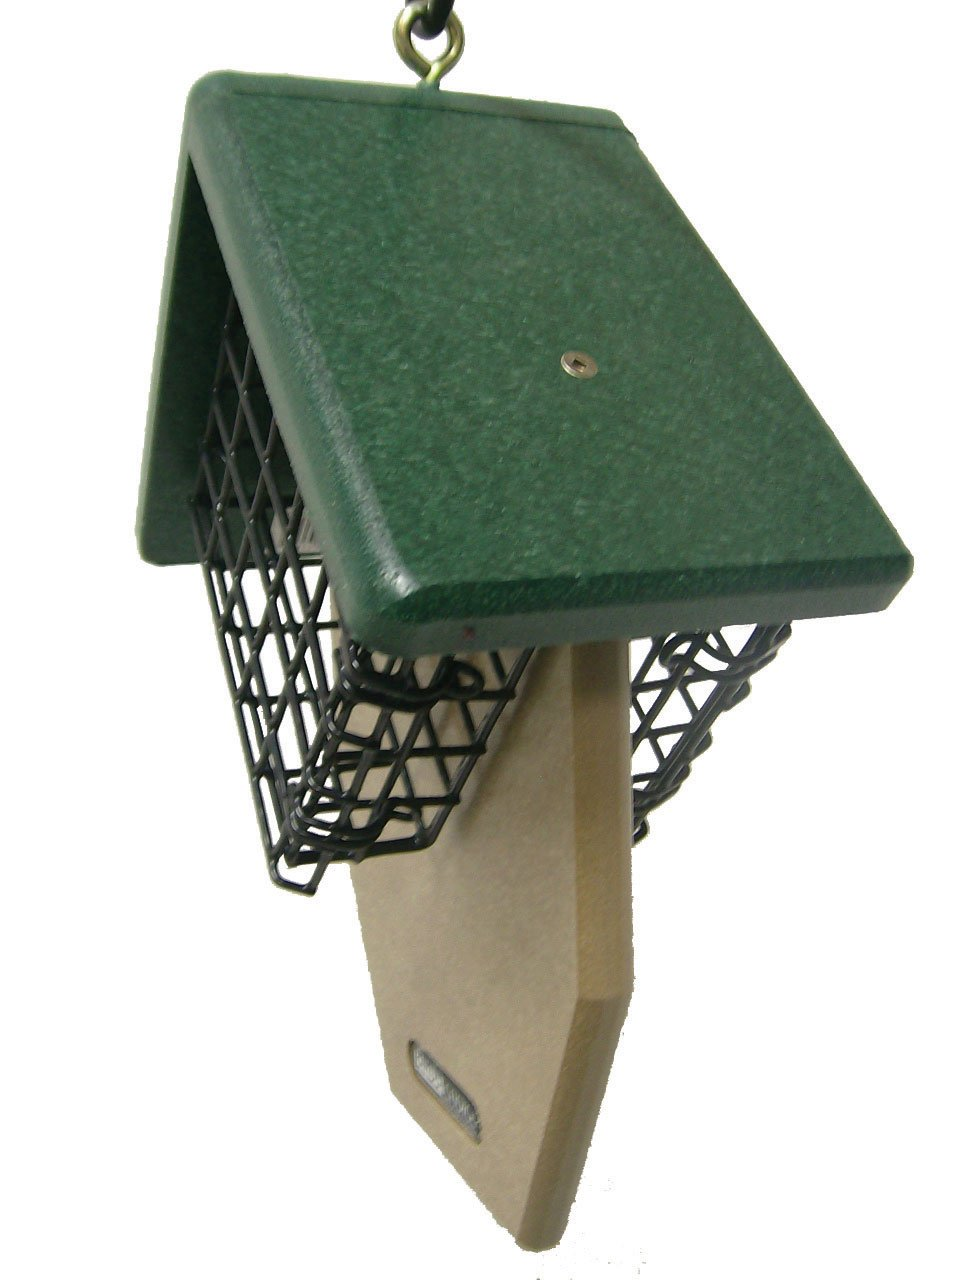 Birds Choice SNDTP Recycled Double & & Recycled B007MRG8CI Tail Prop Suet Feeder B007MRG8CI, ユニフォームネット:4440e747 --- verkokajak.se